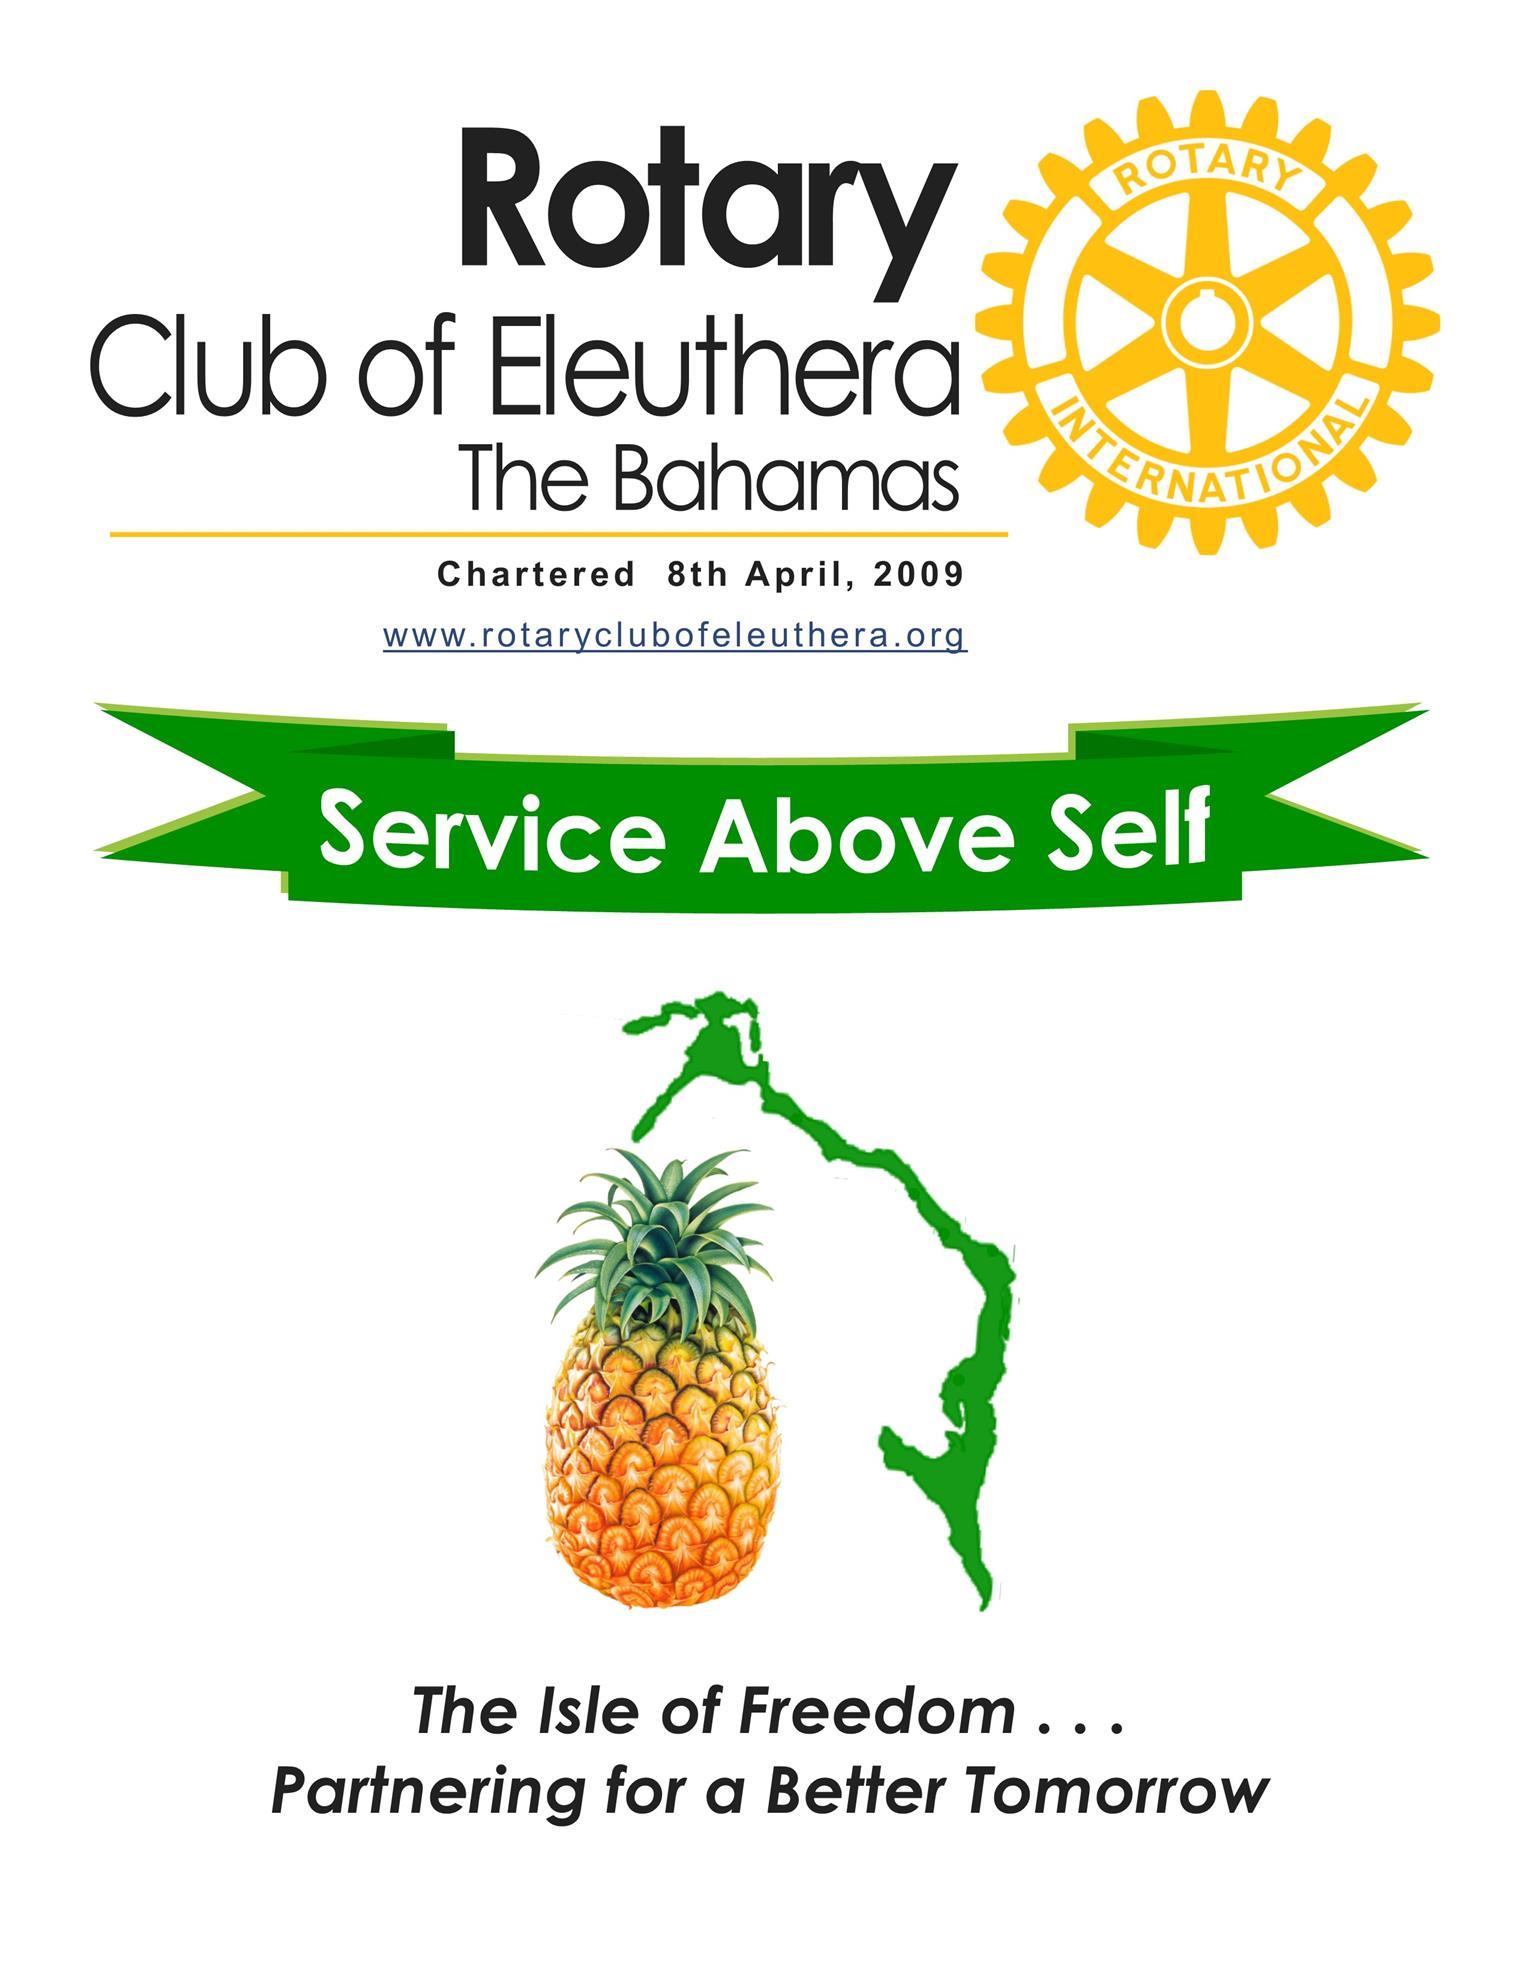 Essay on service above self